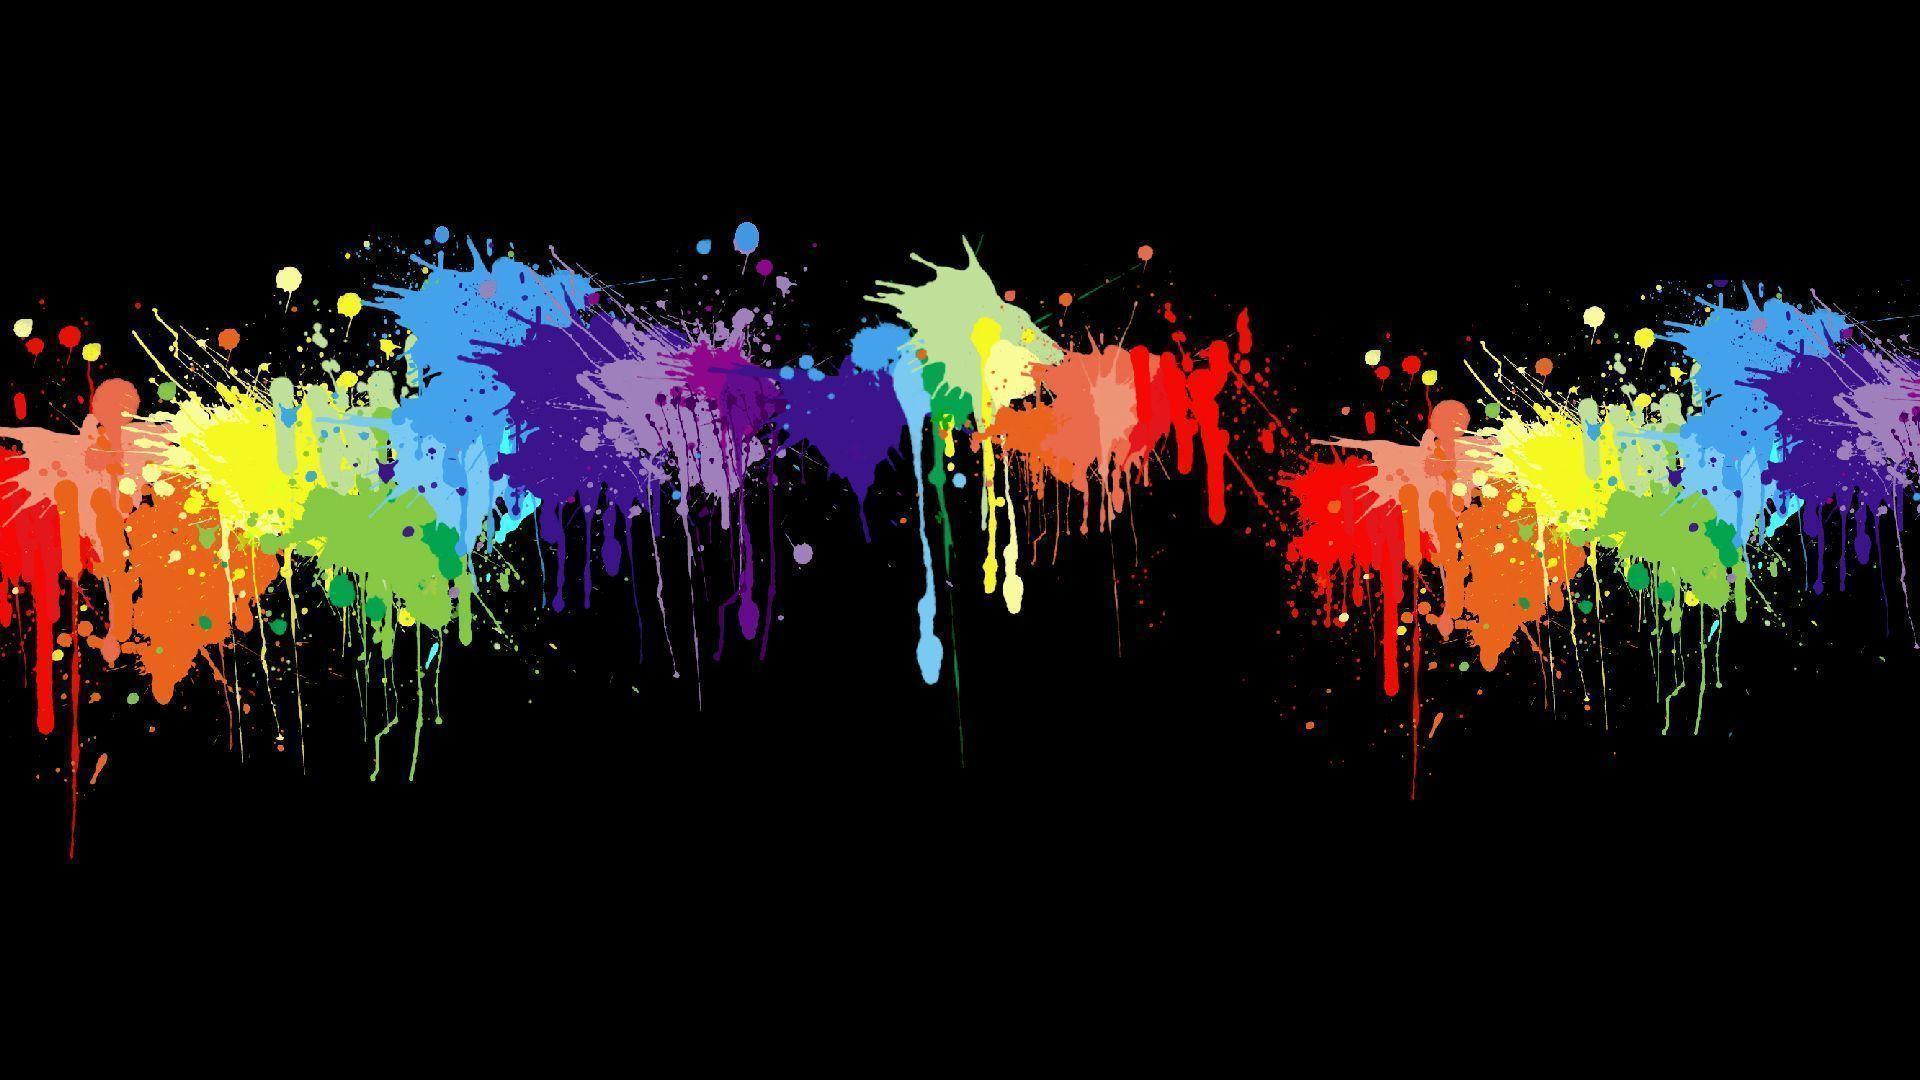 hd wallpapers splash art - photo #23